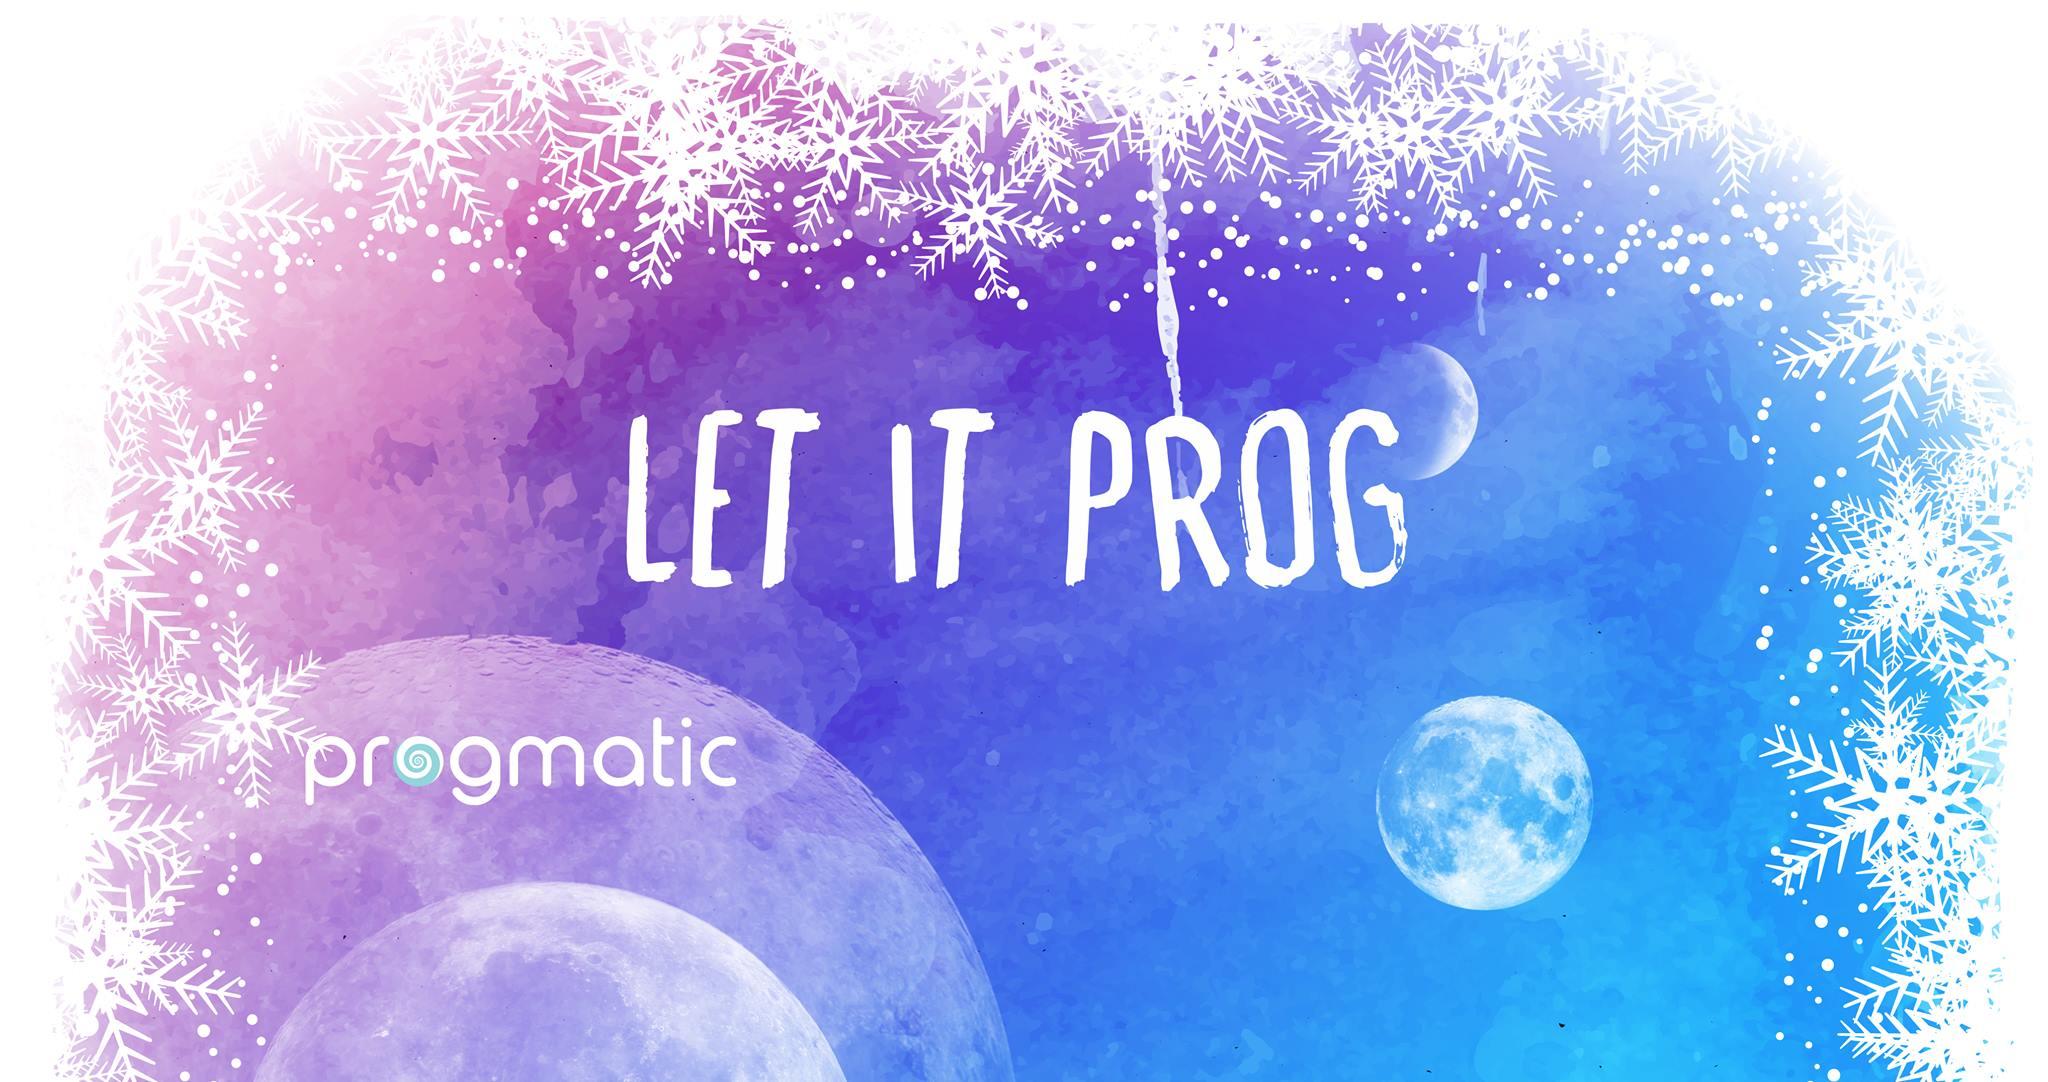 Let It  prog